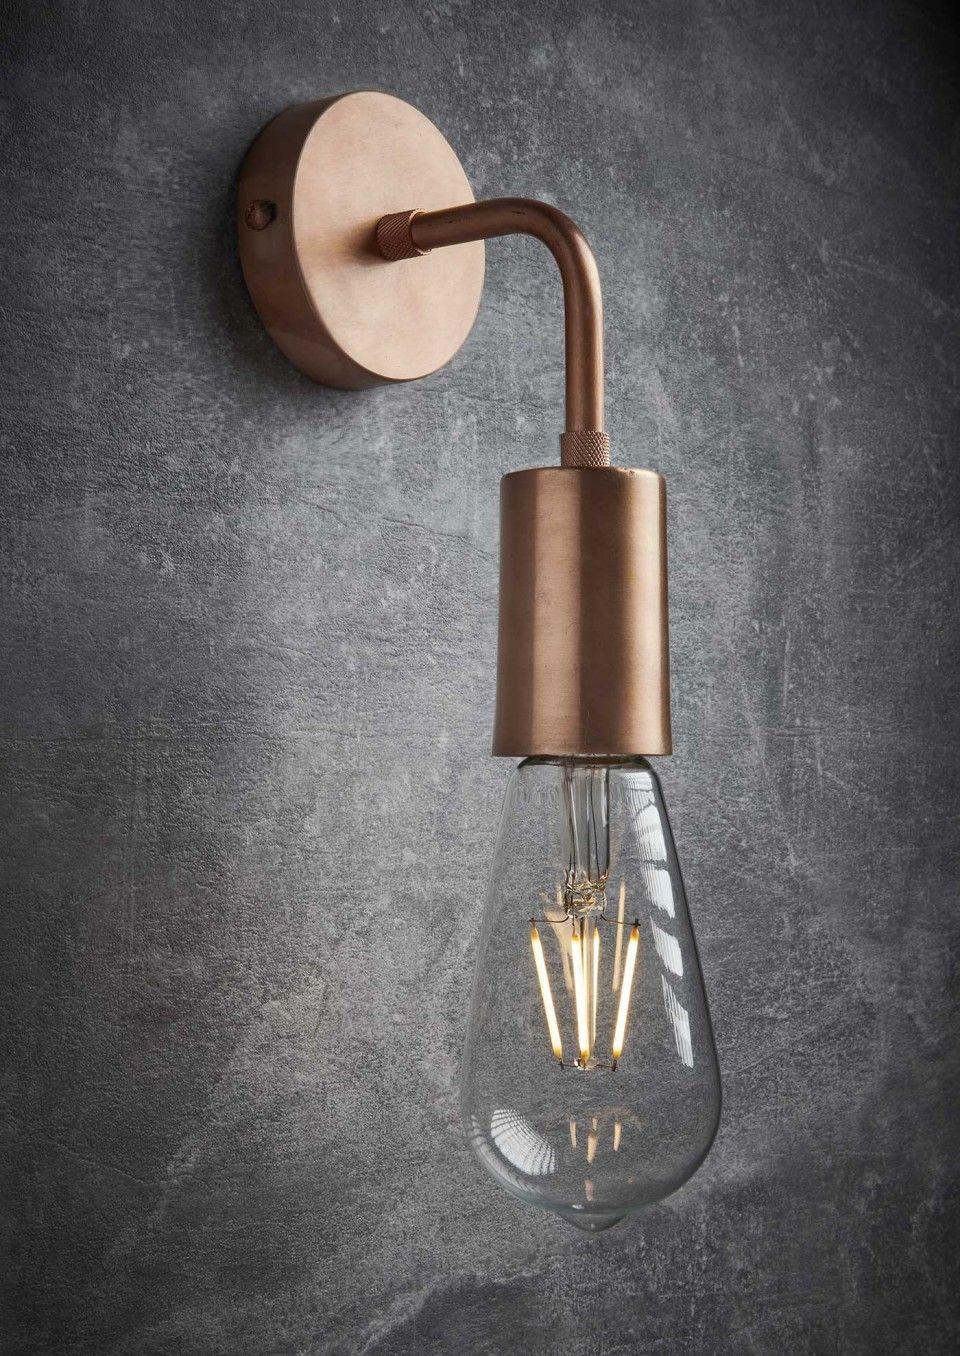 Vintage Sleek Edison Wall Light Copper Industville Metal Wall Light Wall Lights Industrial Wall Lights